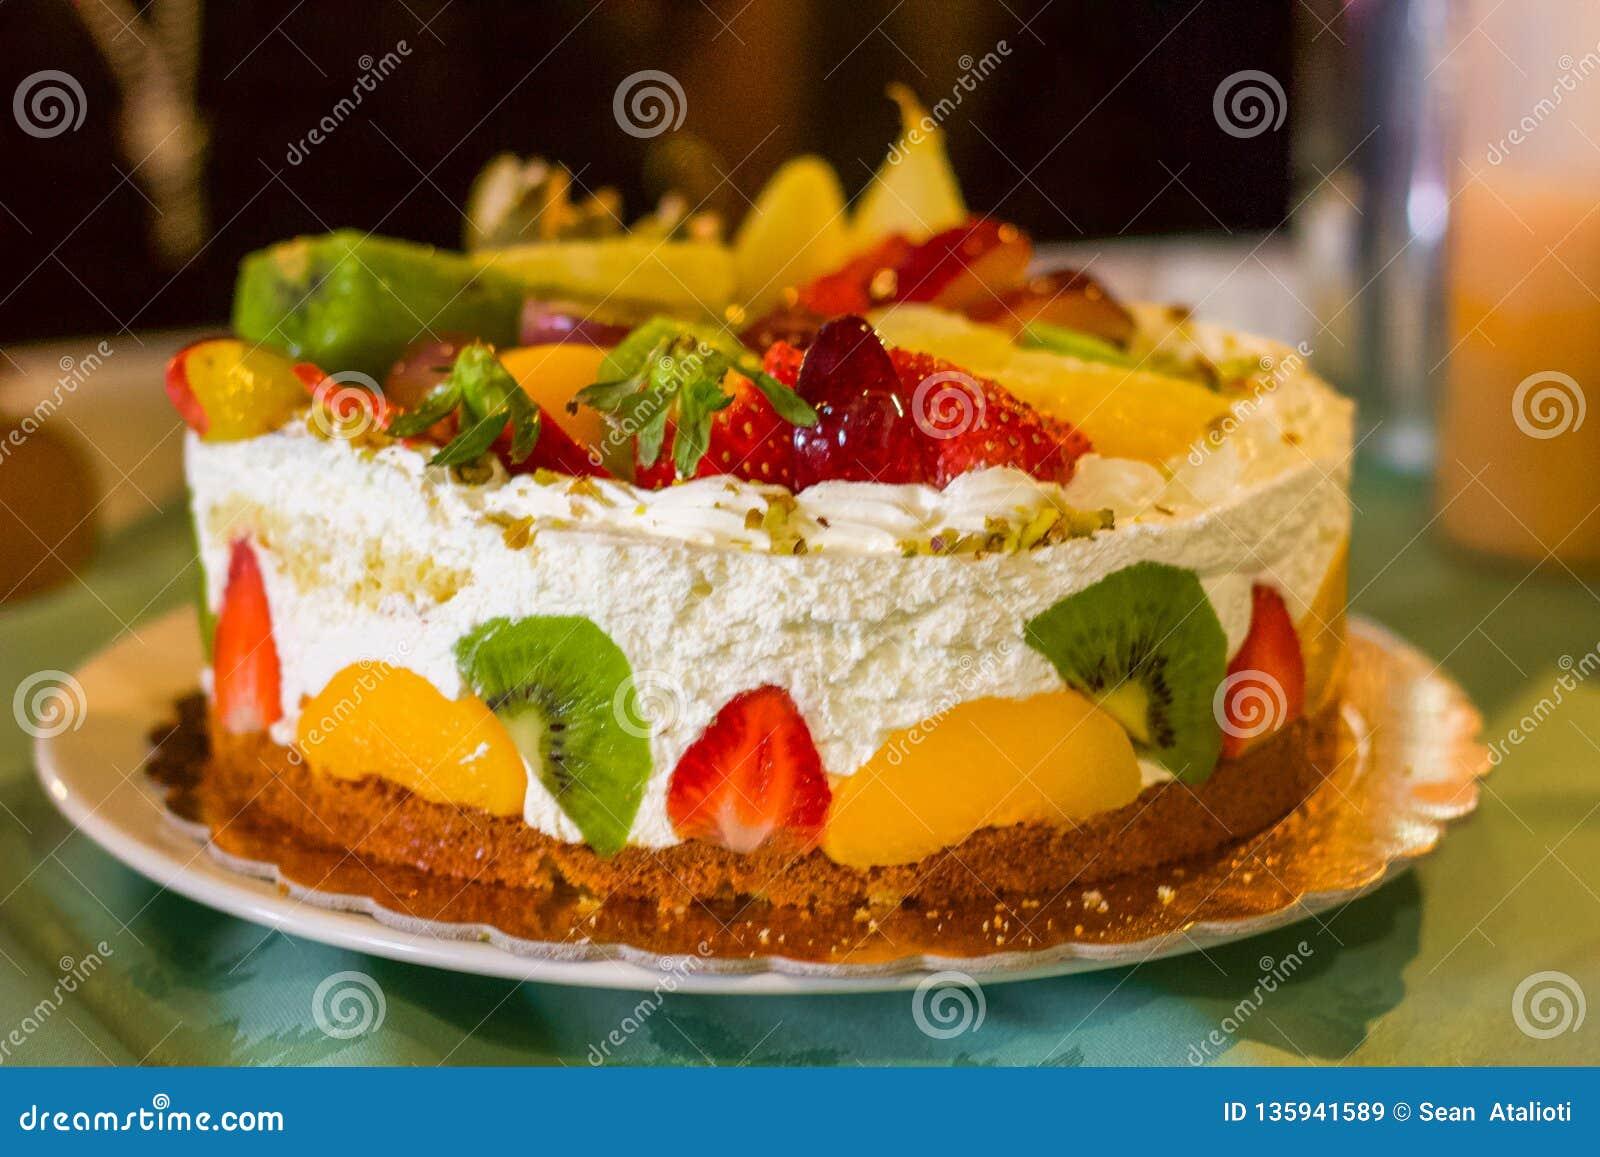 Sensational Birthday Cake Full Of Fresh Cream And Fruit Stock Image Image Of Funny Birthday Cards Online Fluifree Goldxyz